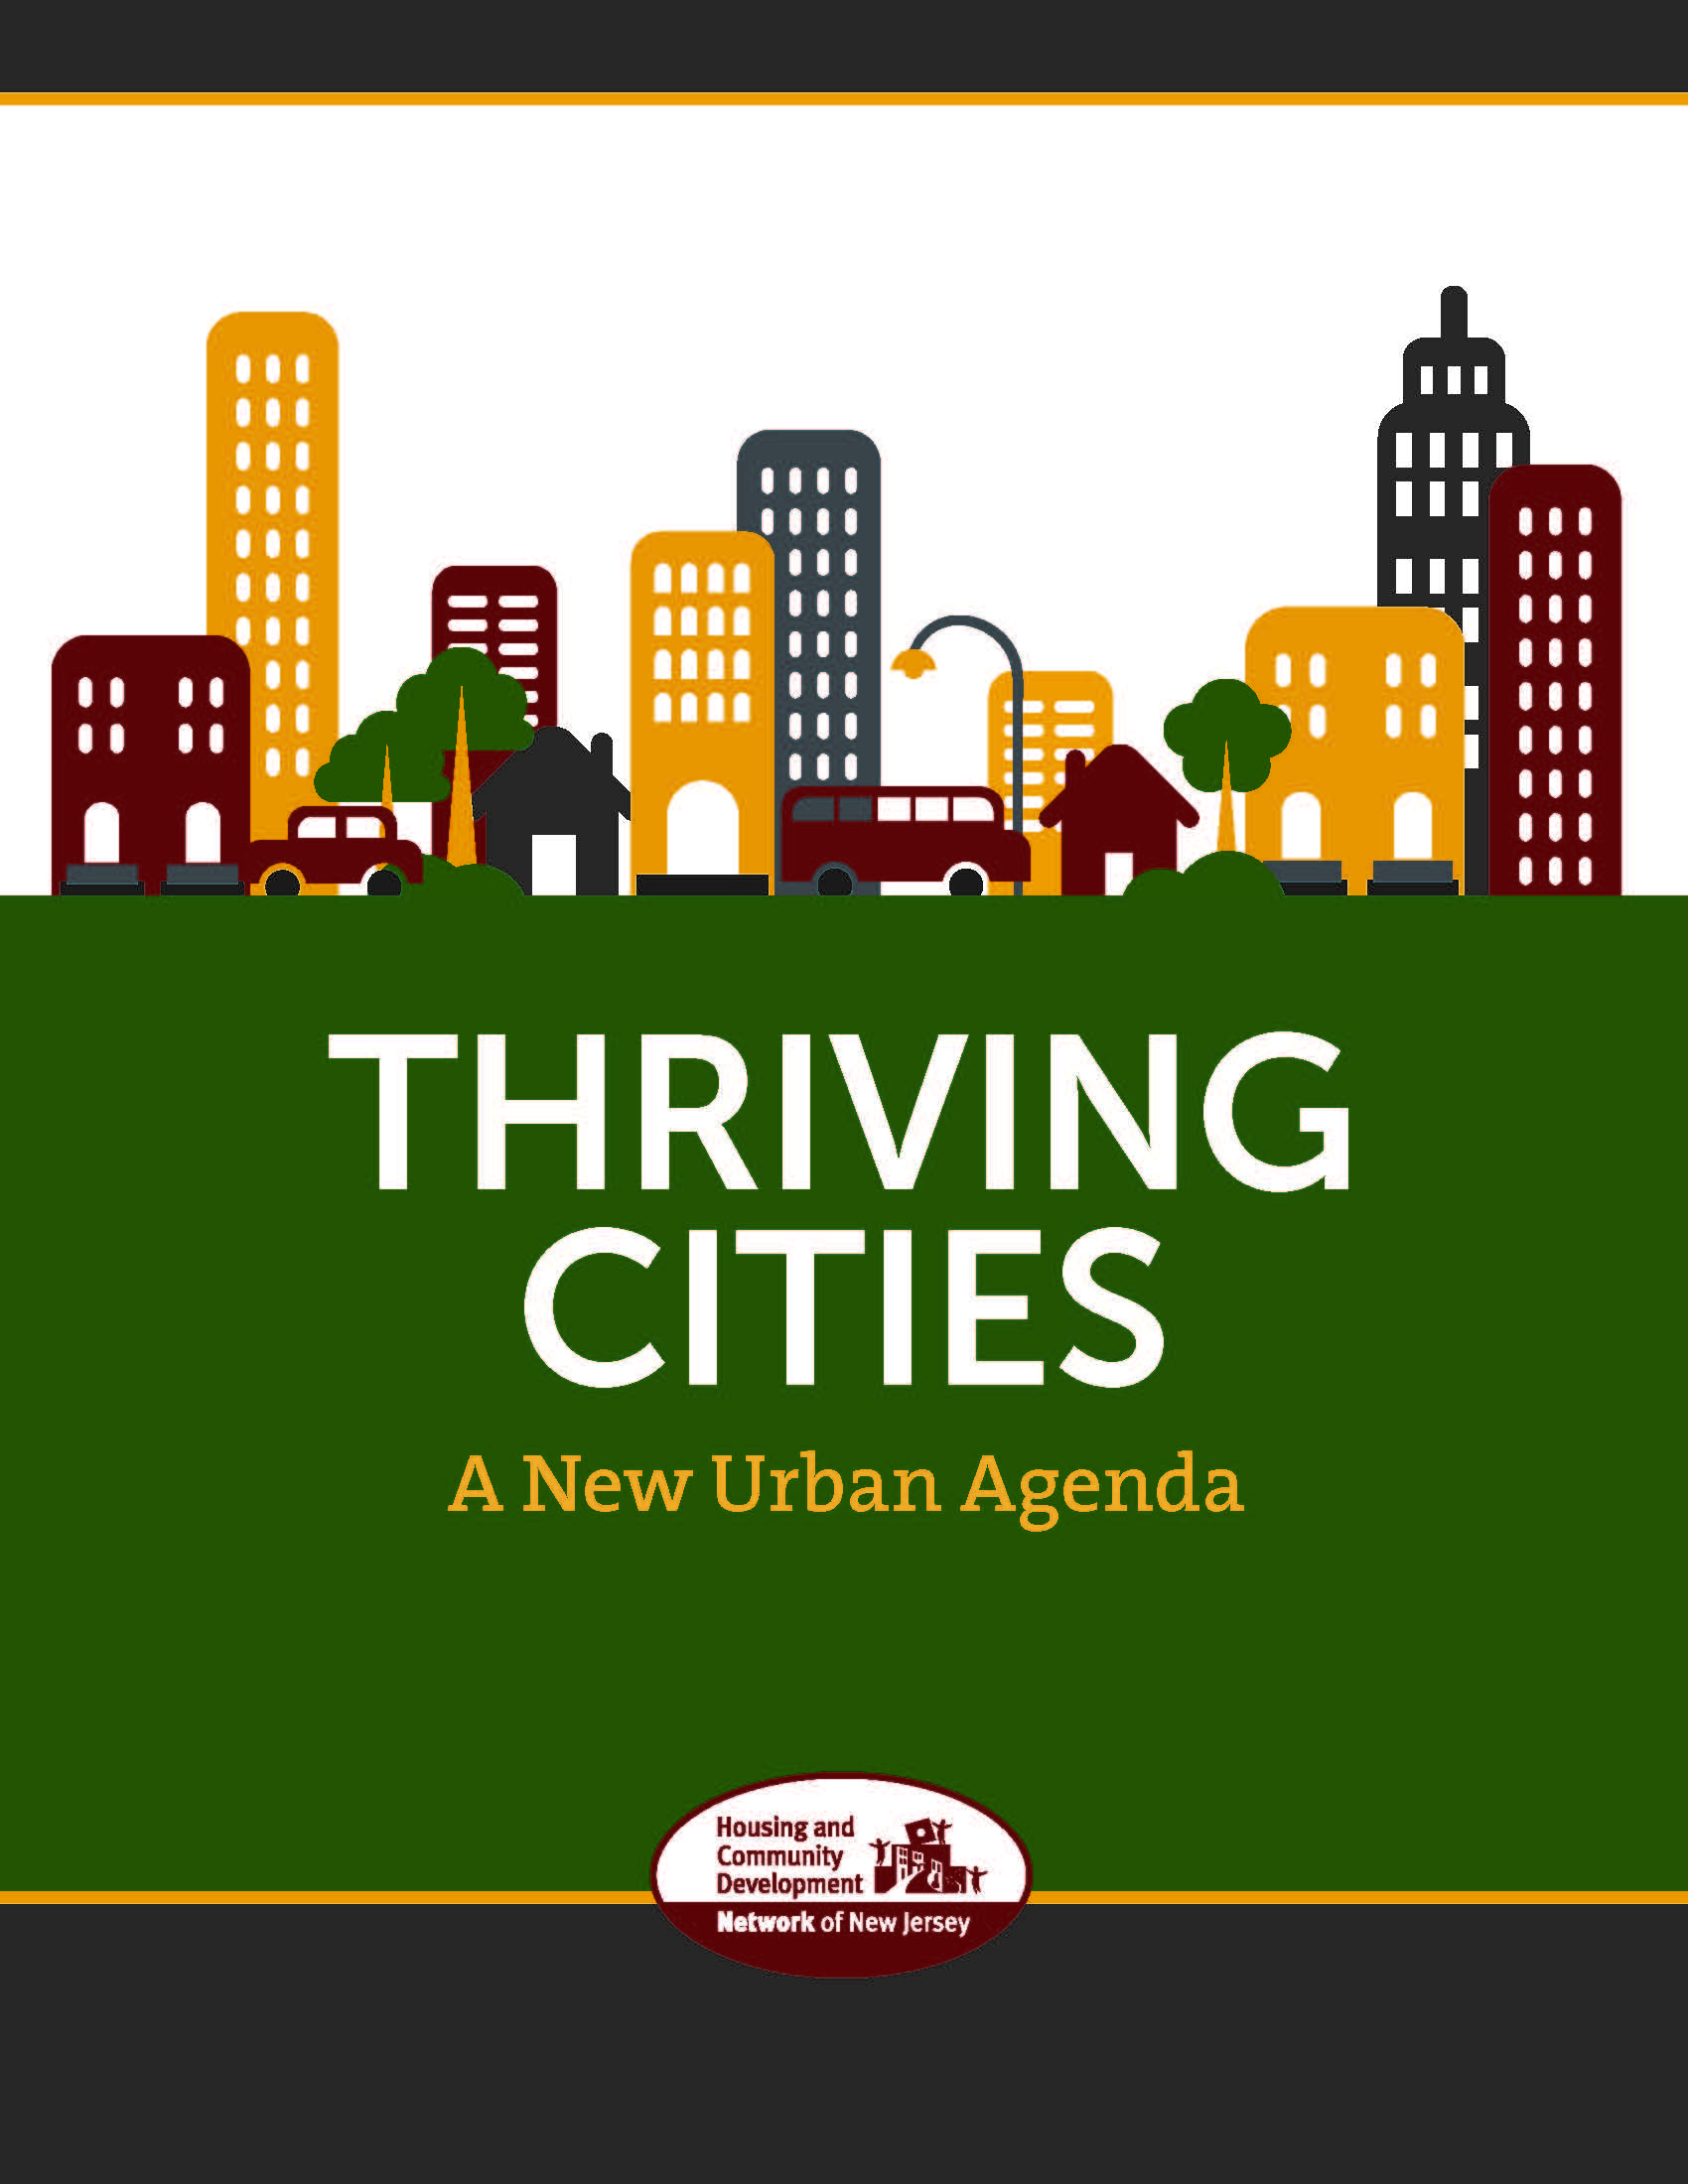 Thriving Cities New Urban Agenda Report_Page_01.jpg